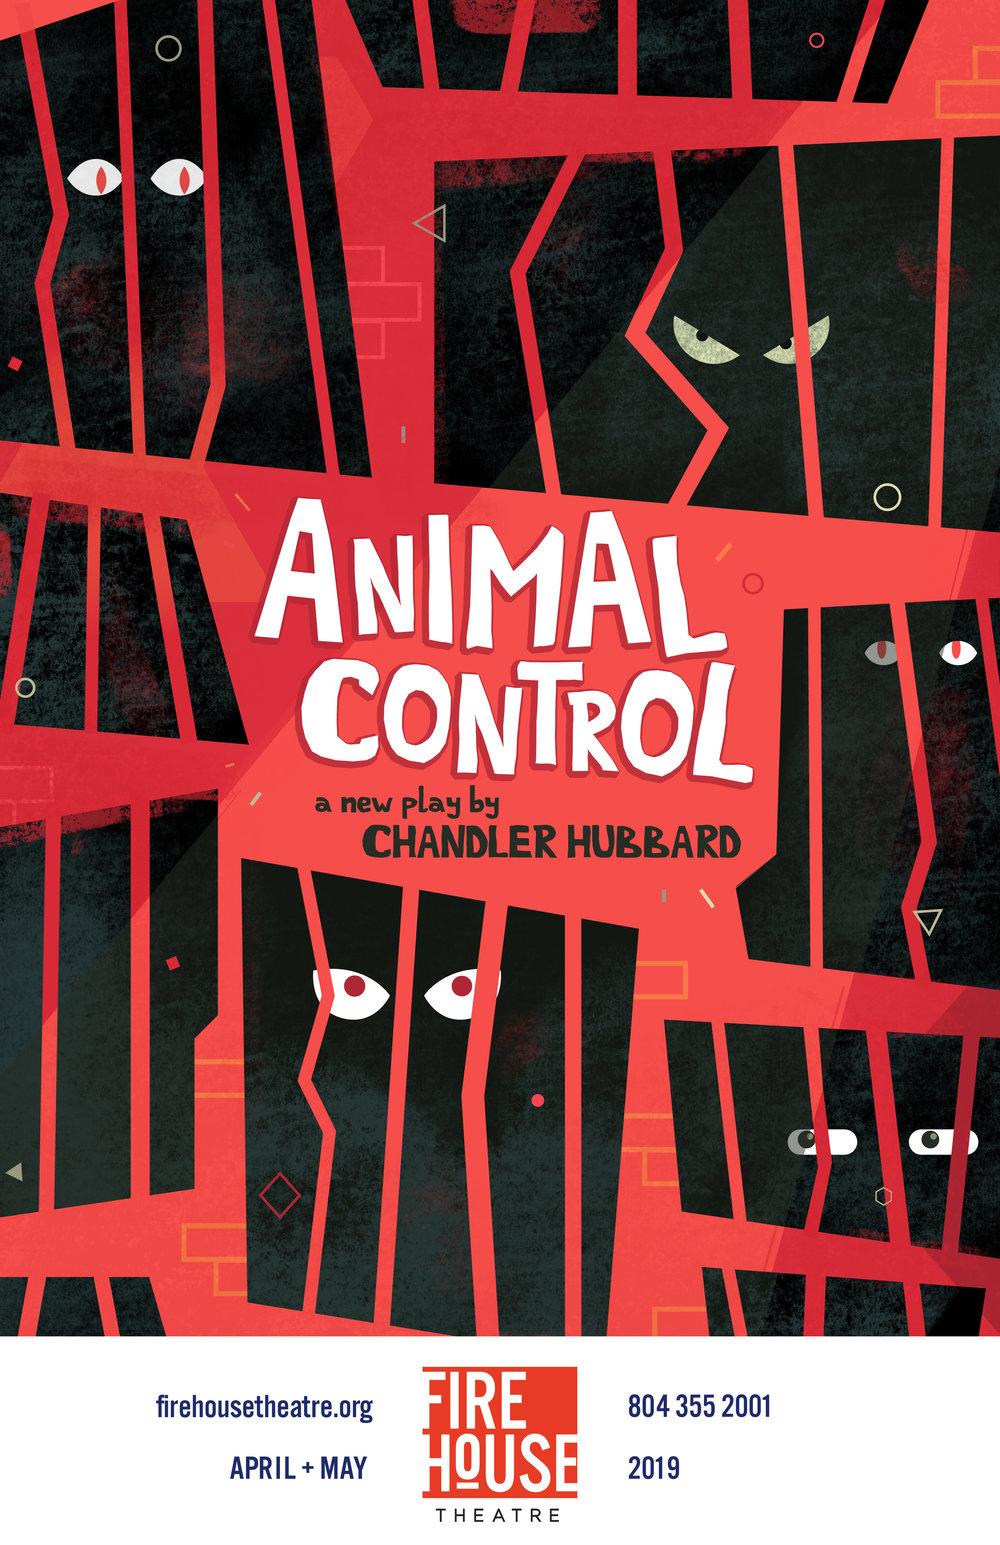 AnimalControl_Poster-02.jpg